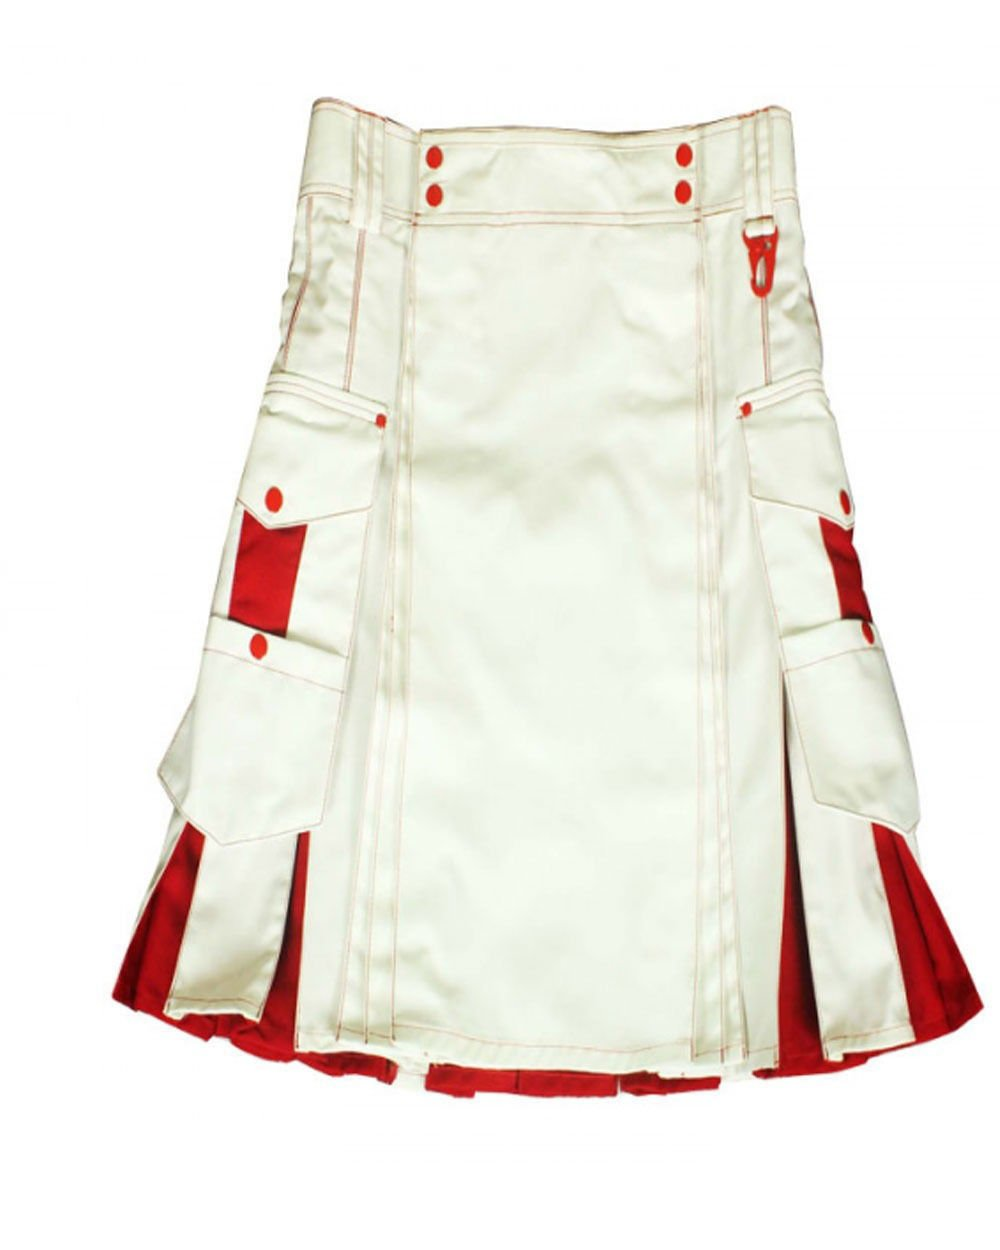 DC Traditional White Scottish Modern Utility Kilt Handmade 100% Cotton Size 46